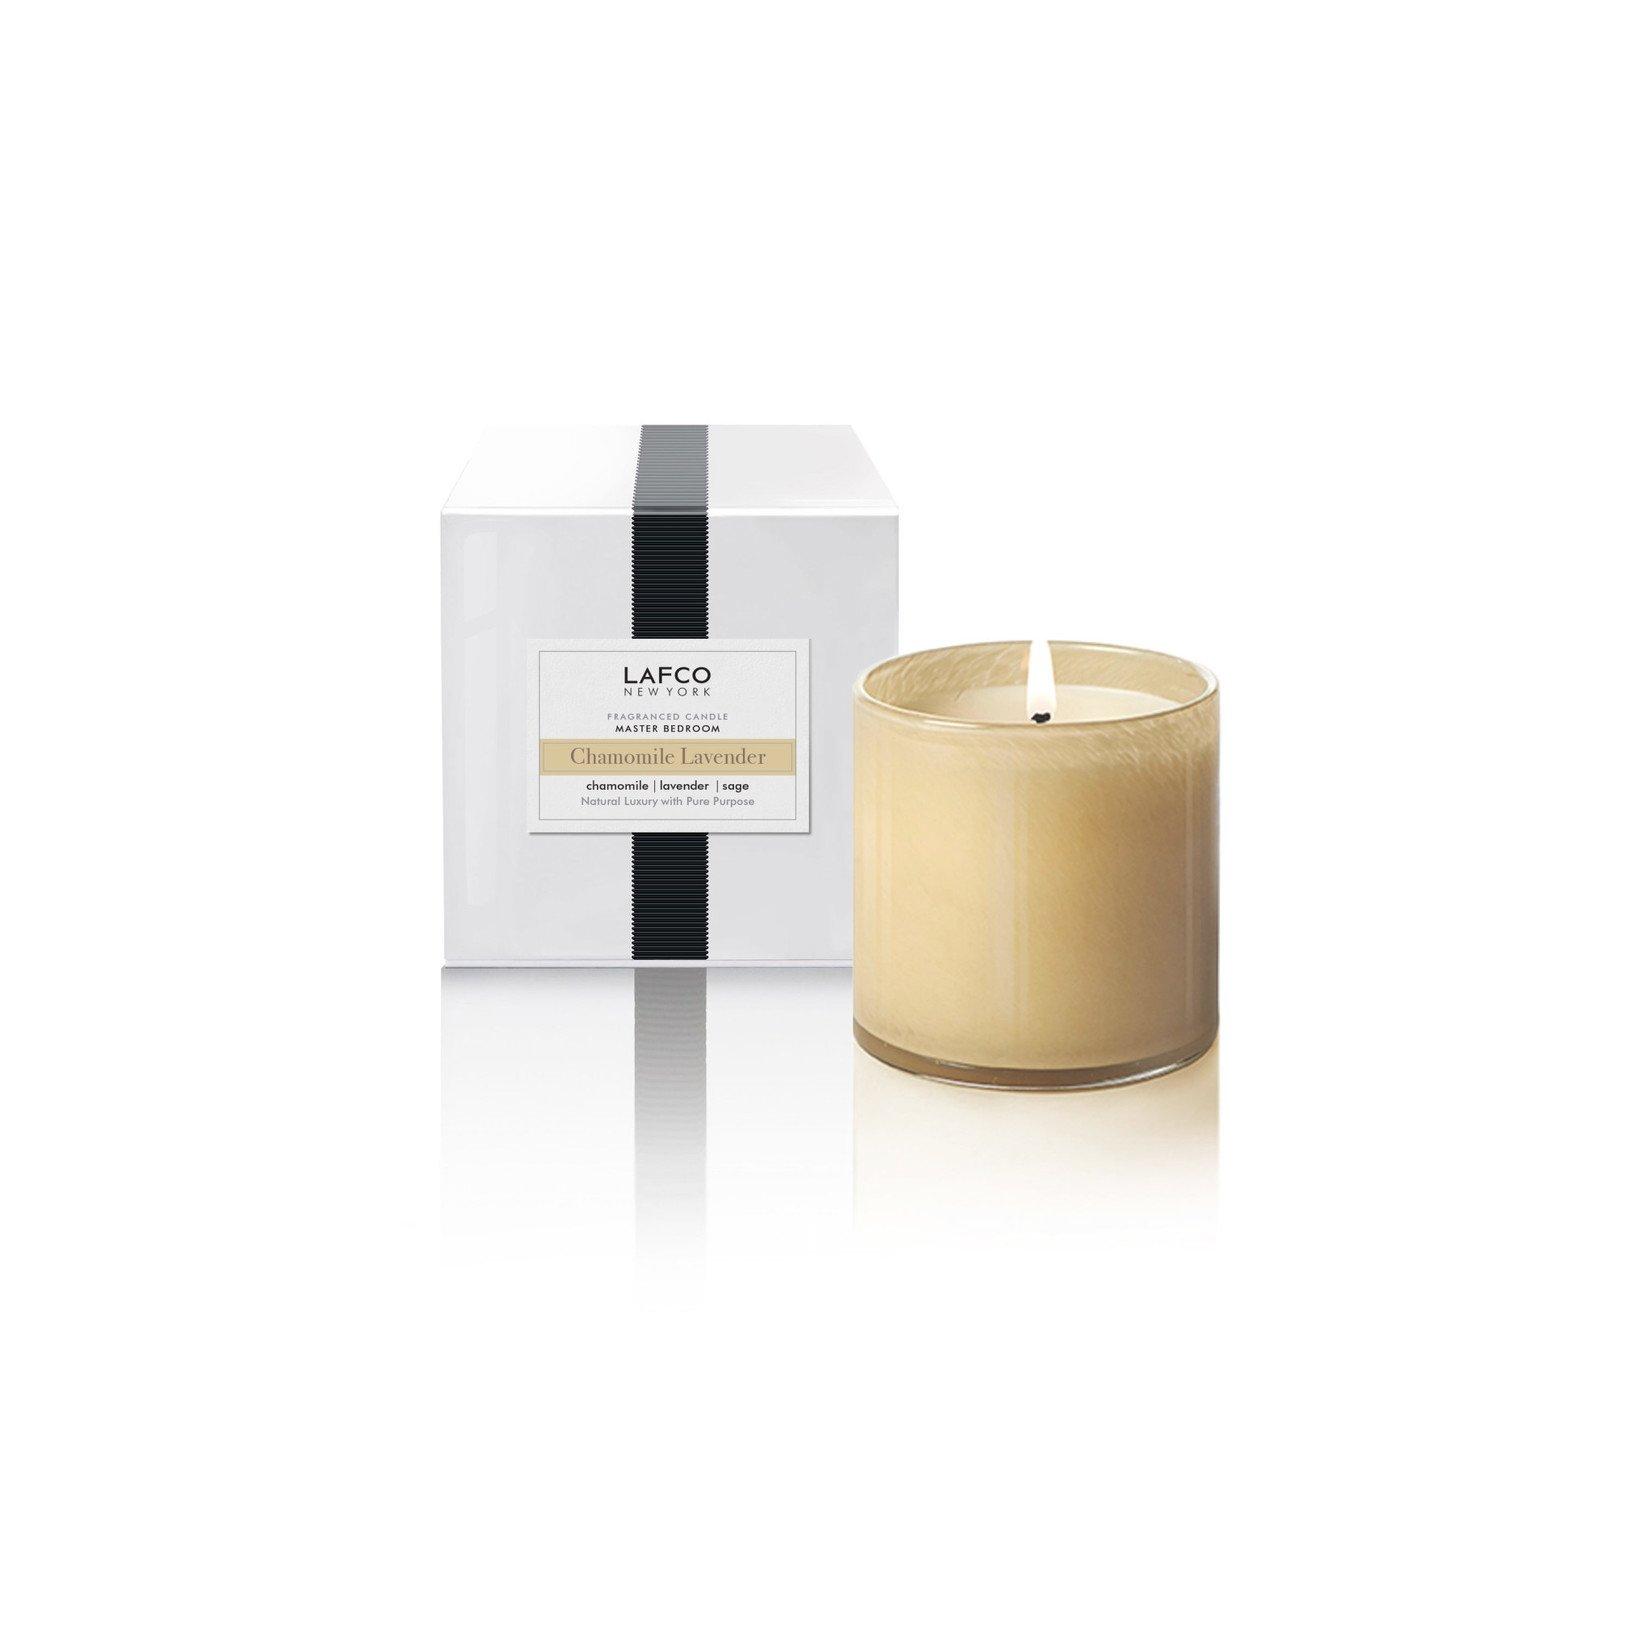 Chamomile Lavender Bedroom Candle